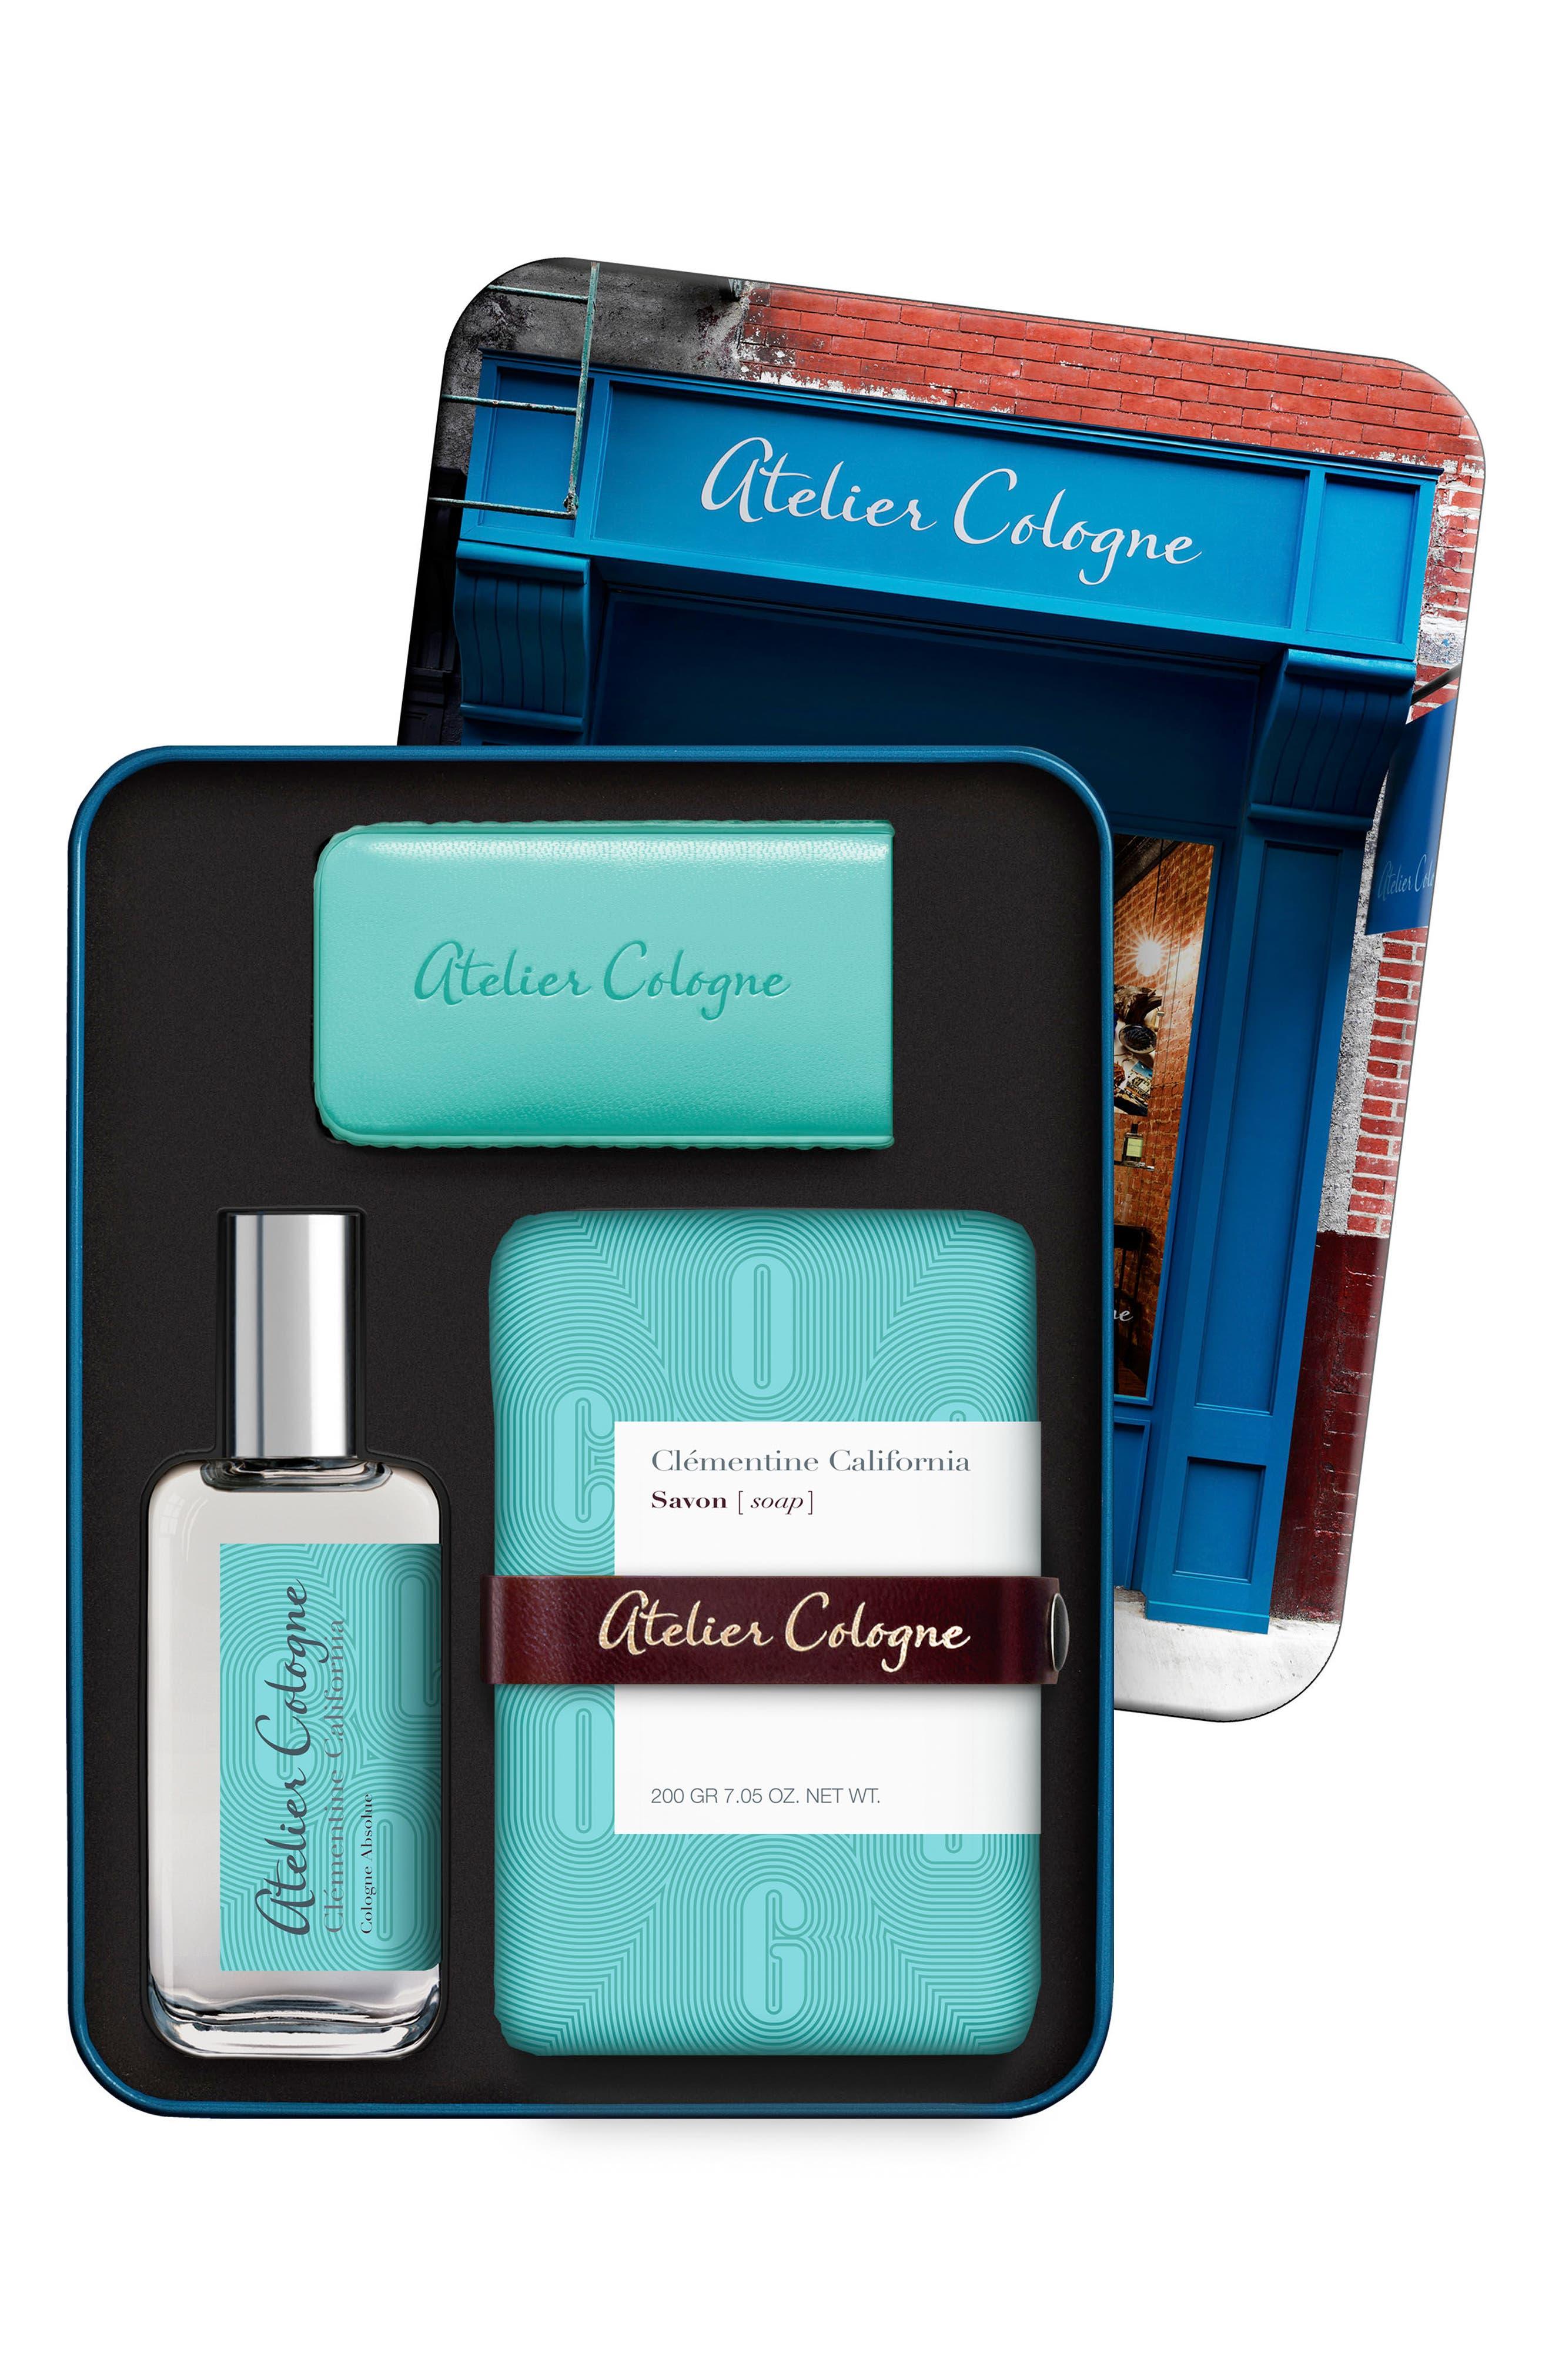 Main Image - Atelier Cologne Clémentine California Nécessaire Voyage Collection (Nordstrom Exclusive) ($120 Value)